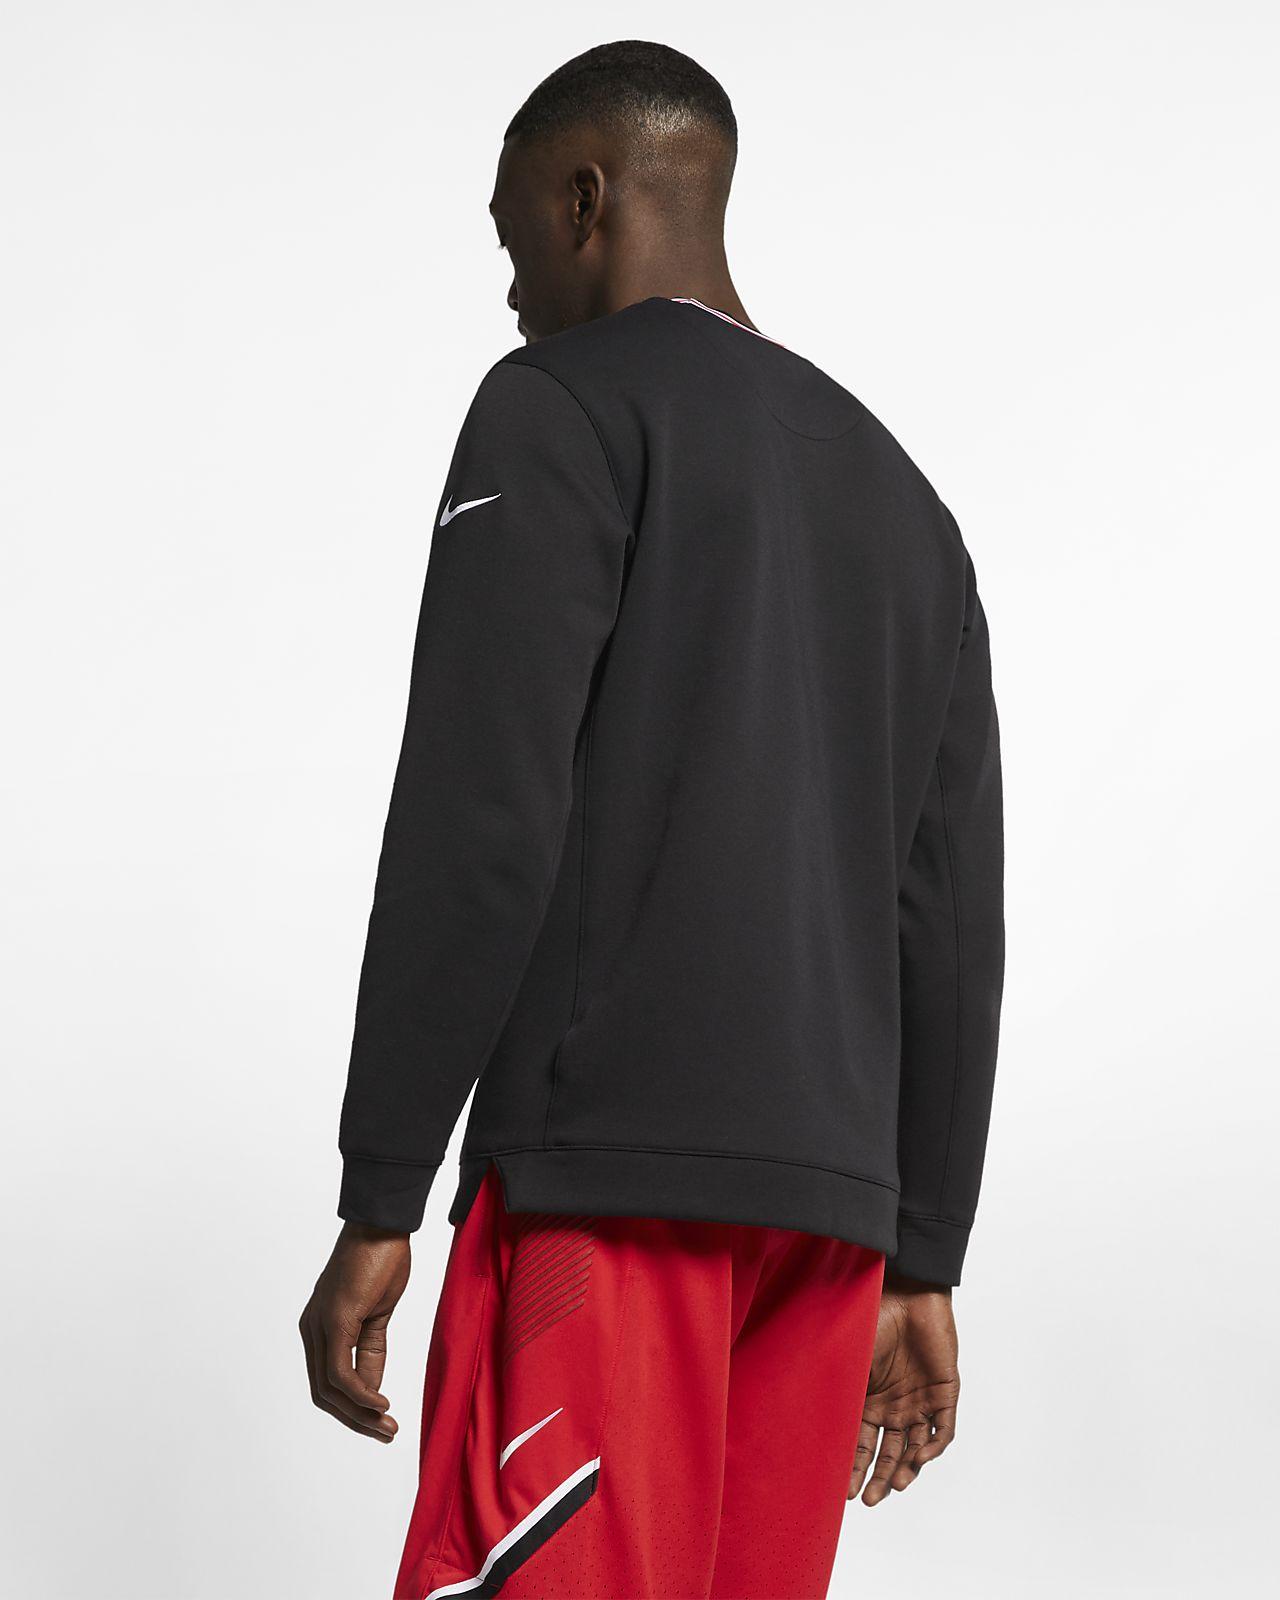 7c0419a61 Nike Dri-FIT Men's Long-Sleeve Basketball Top. Nike.com